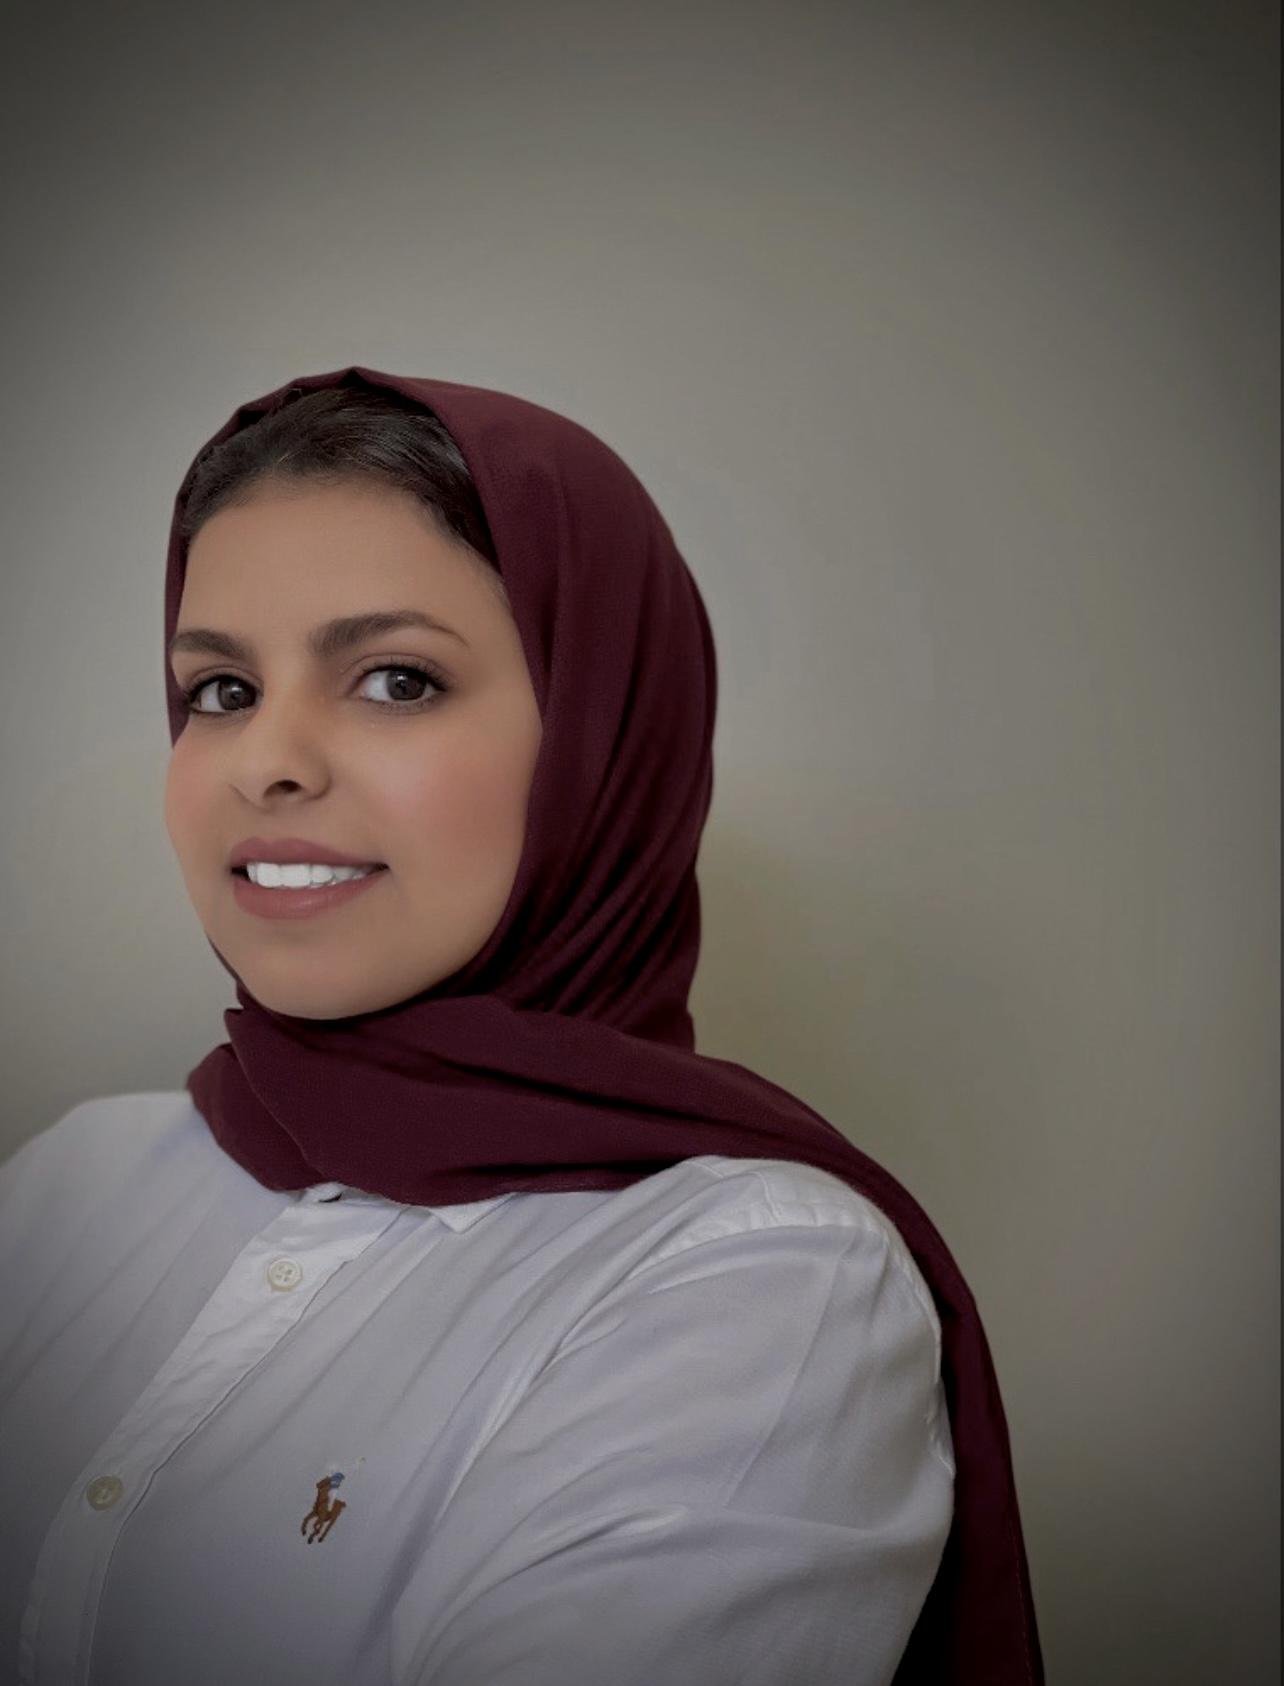 Fatimah Almathami